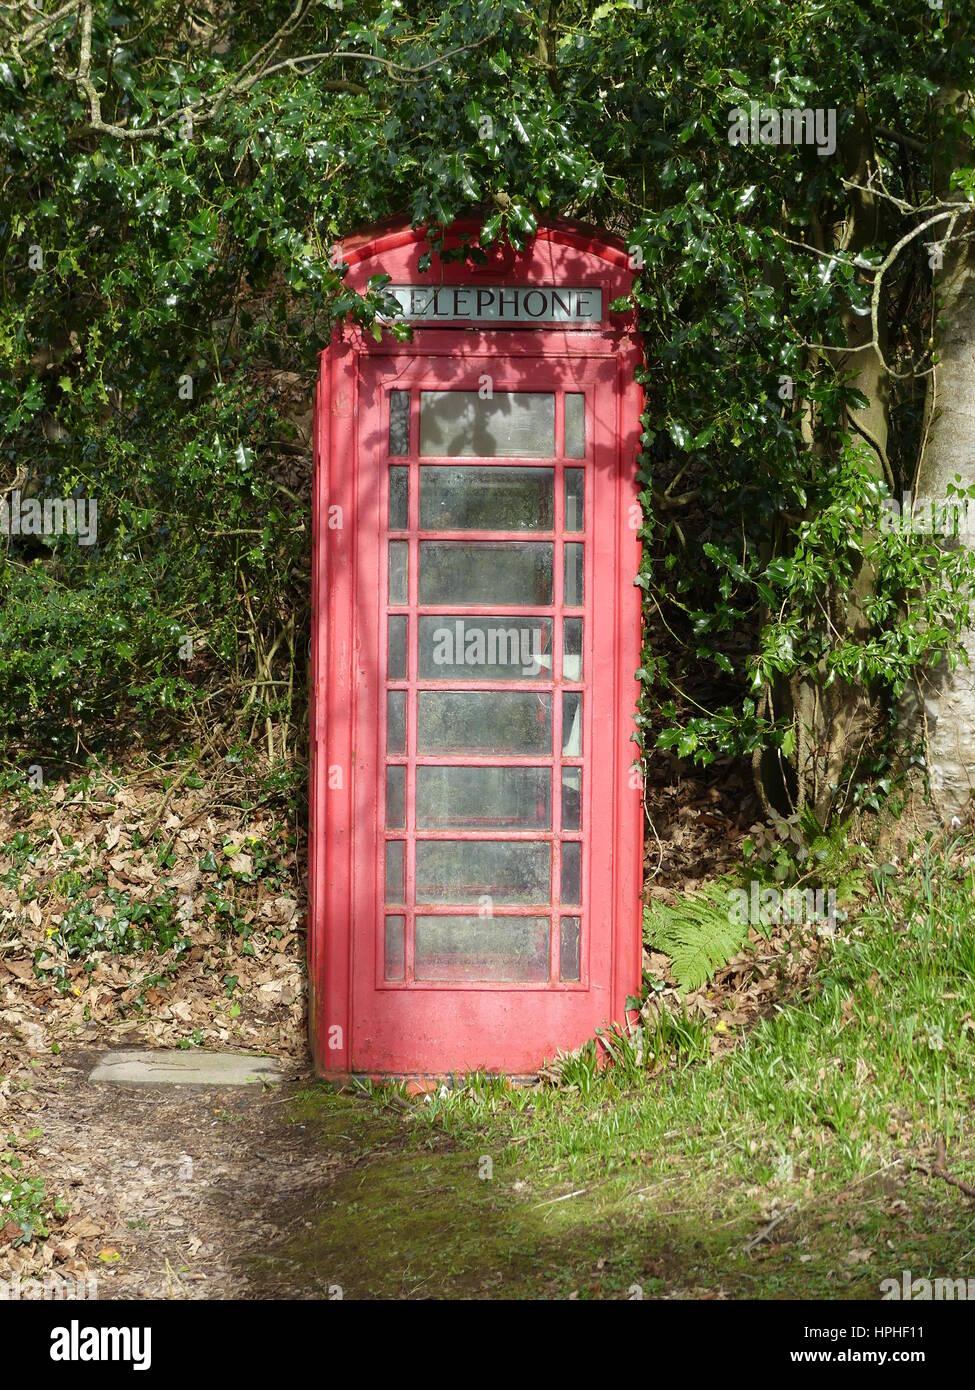 Red phone box - Stock Image